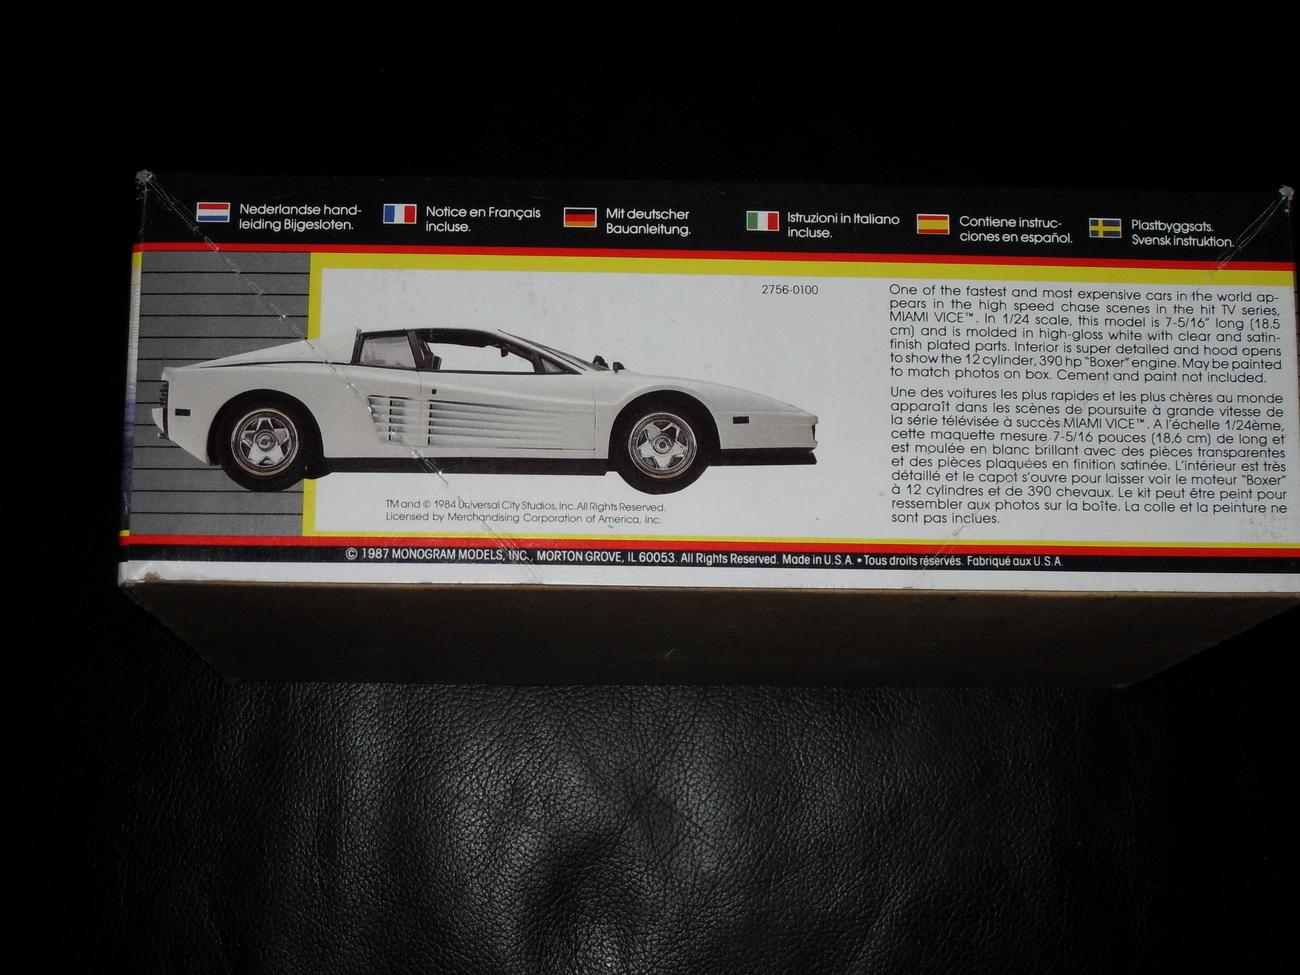 1987 Monogram Model Kit Miami Vice Ferrari Testarossa